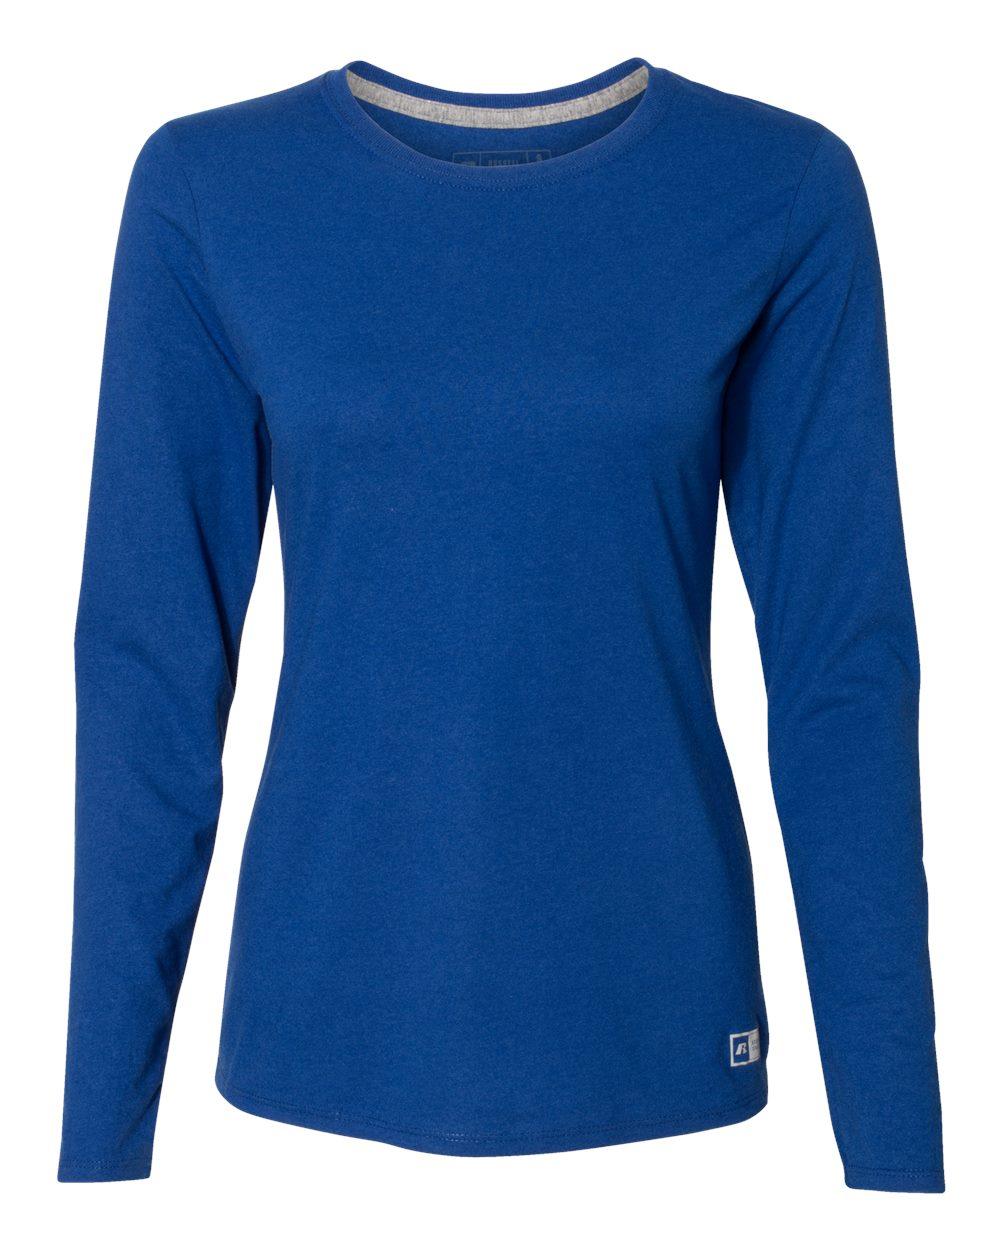 Kleidung & Accessoires Damenmode Jack Russell Gone Wild Womens Tee Shirt Pick Size Color Petite Regular